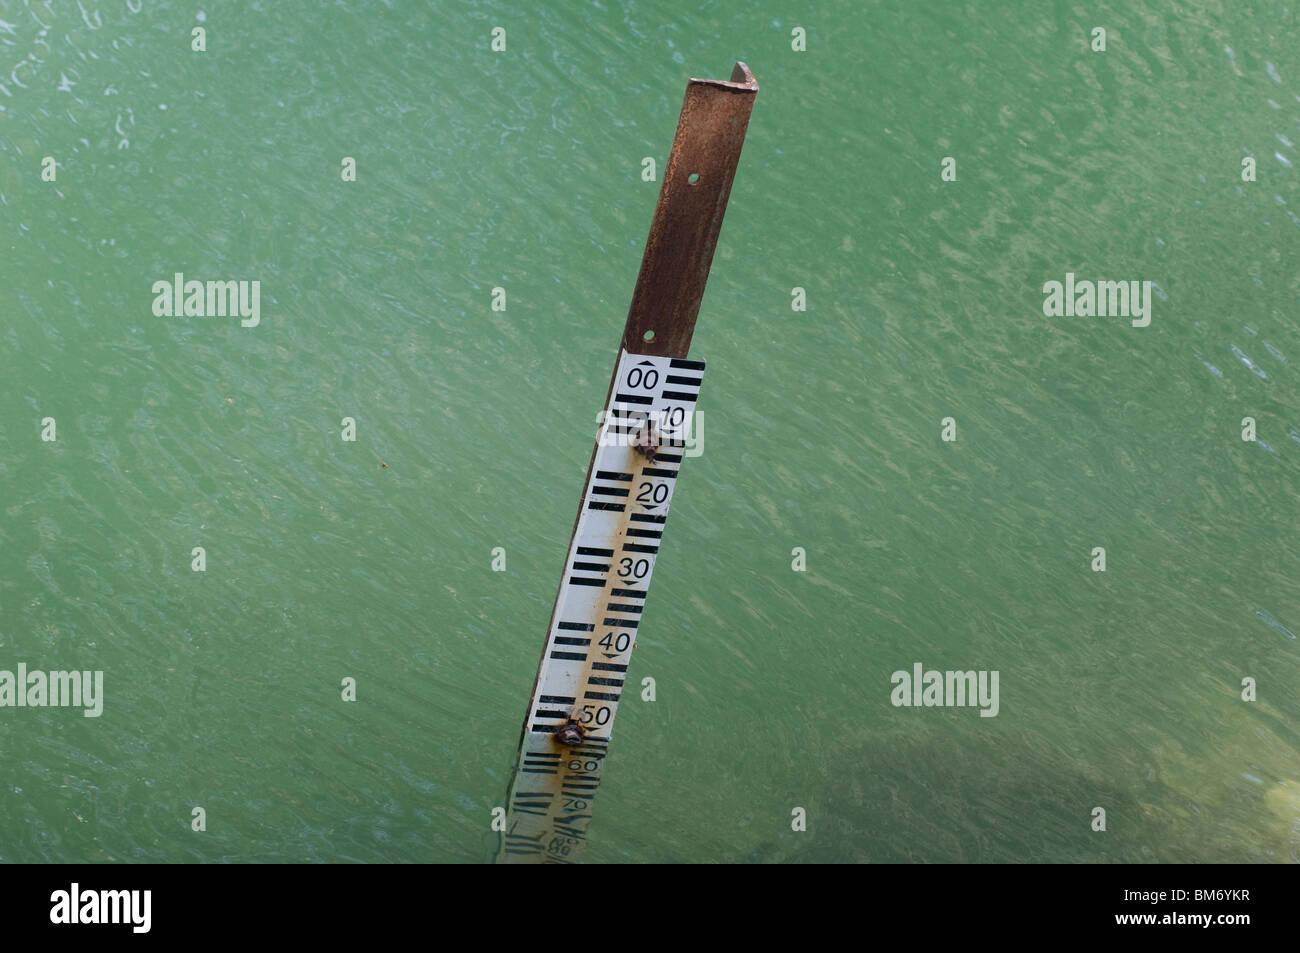 Water level gauge indicators at the Jordan river close to the lake Kineret Galilee Northern Israel - Stock Image